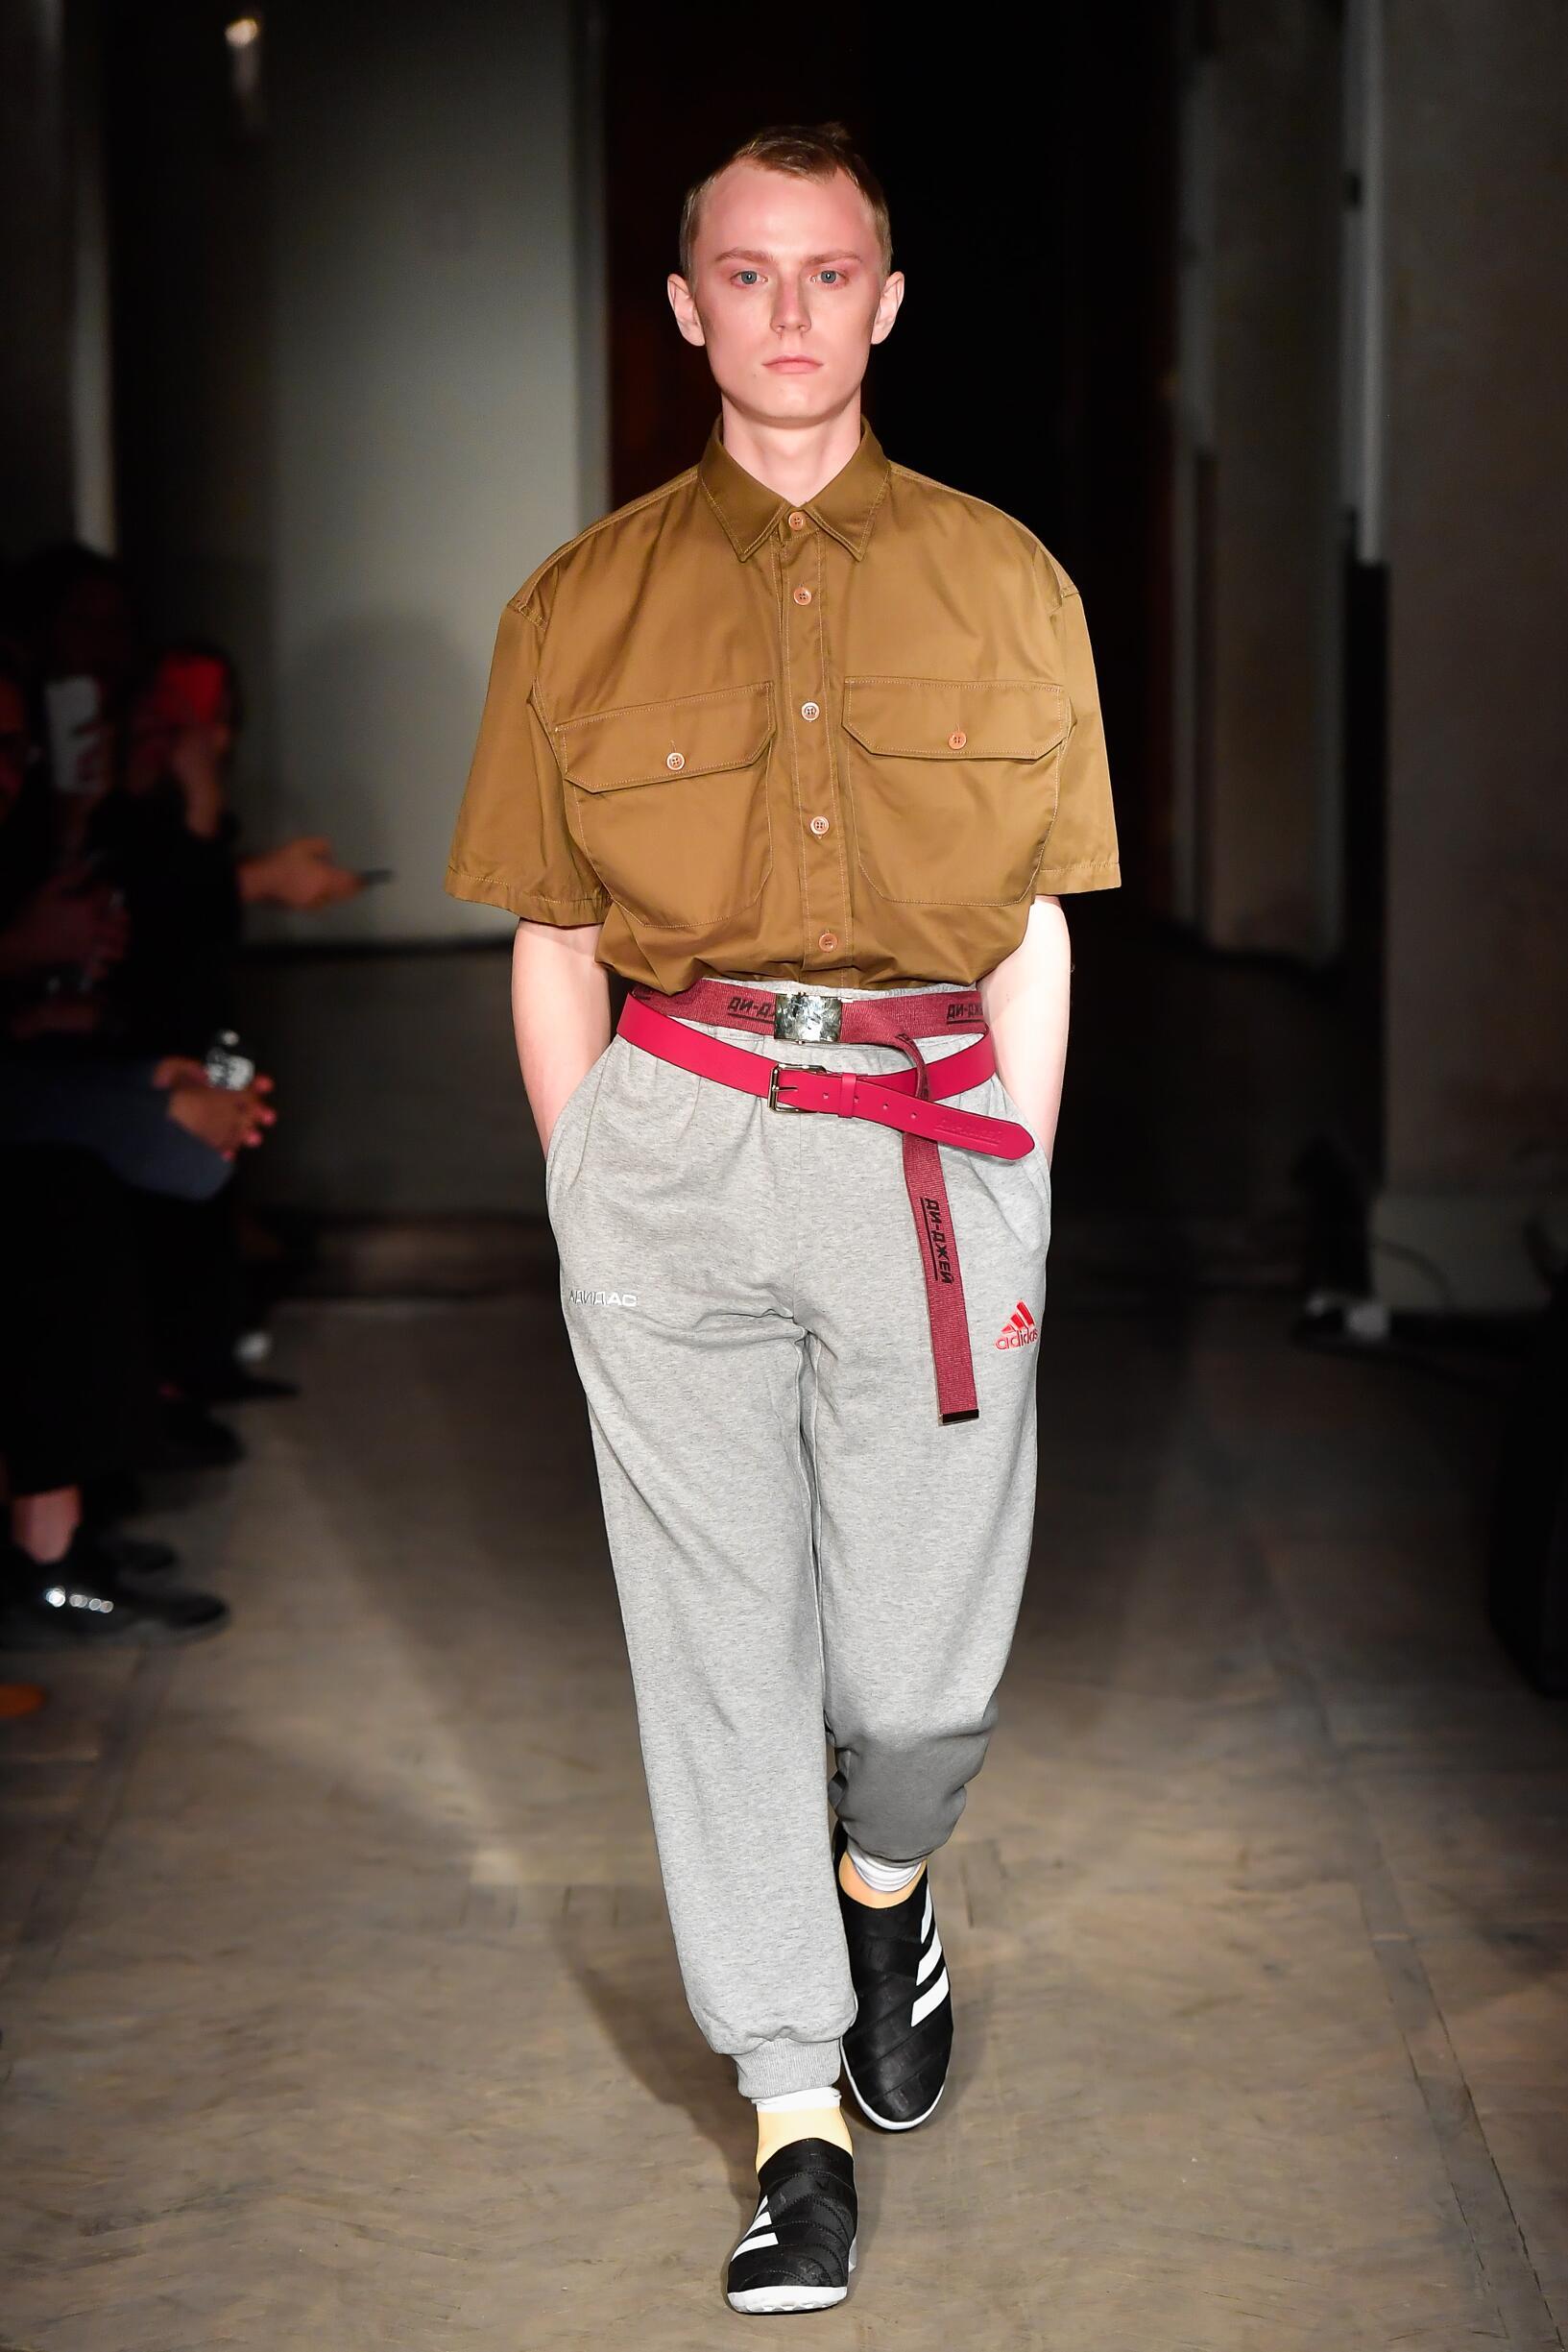 Gosha Rubchinskiy Saint Petersburg Fashion Week Menswear